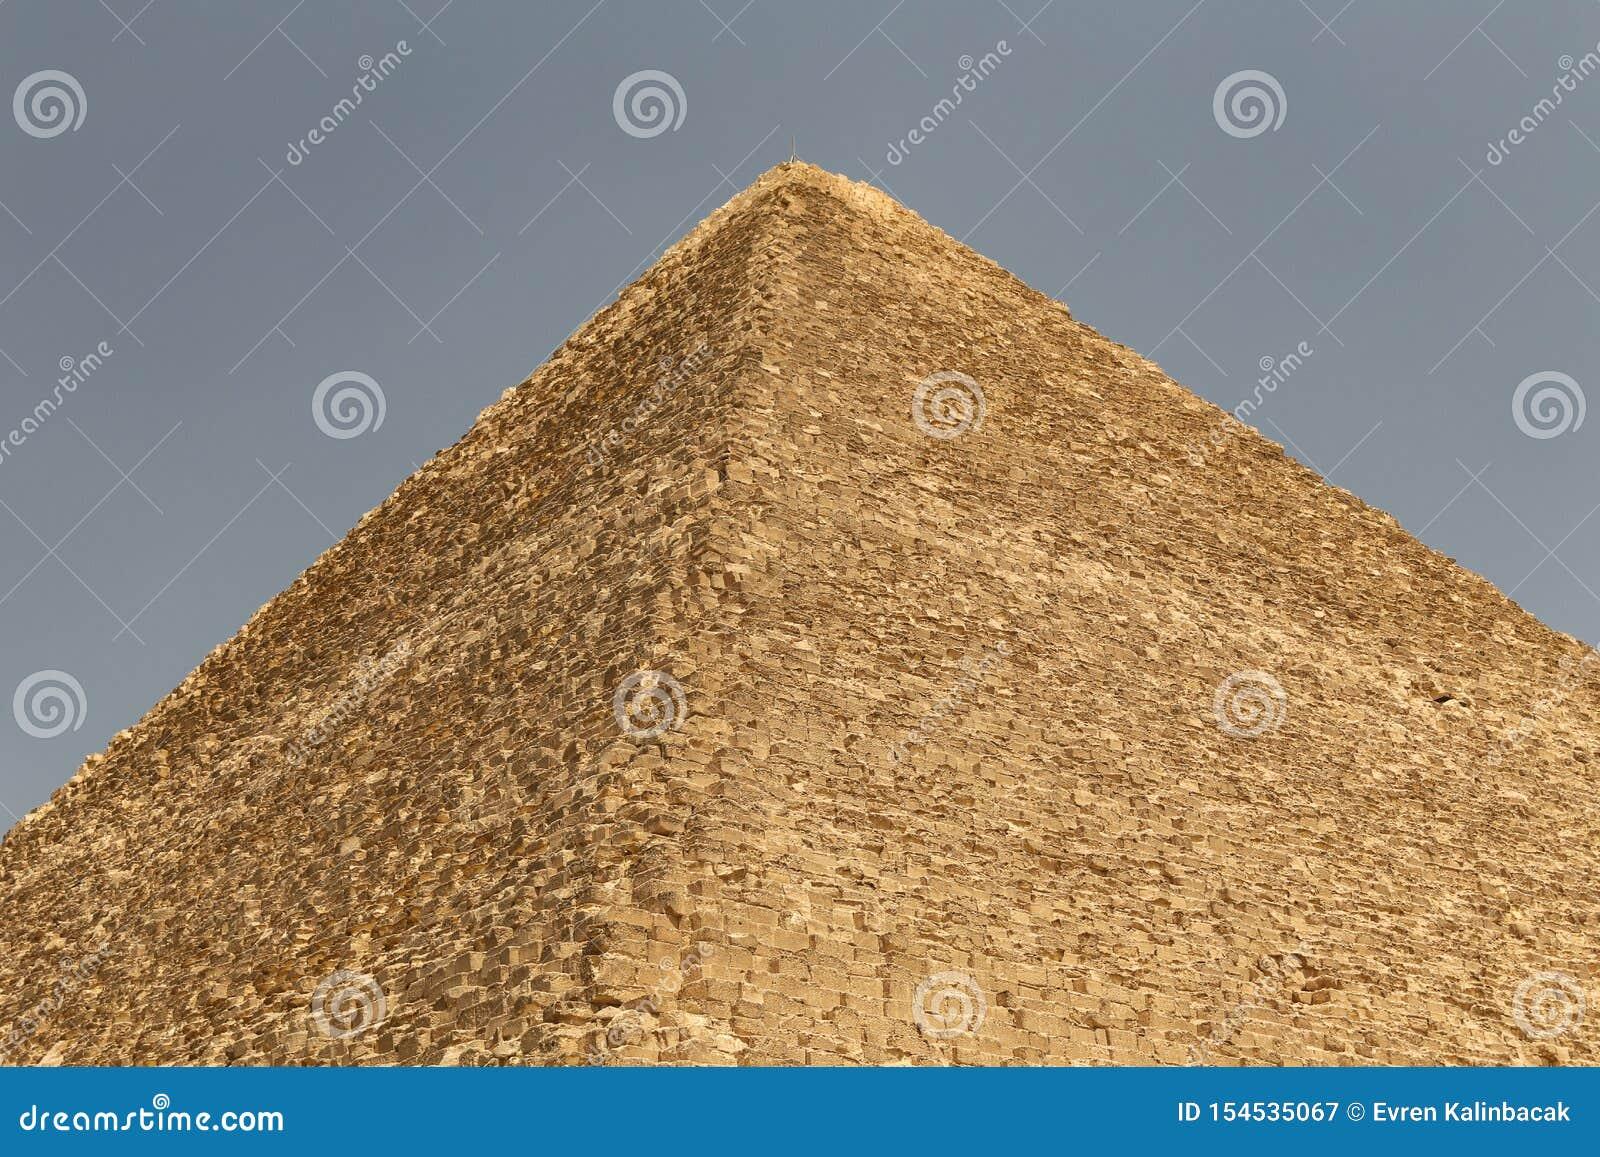 Stor pyramid av Giza i det Giza pyramidkomplexet, Kairo, Egypten